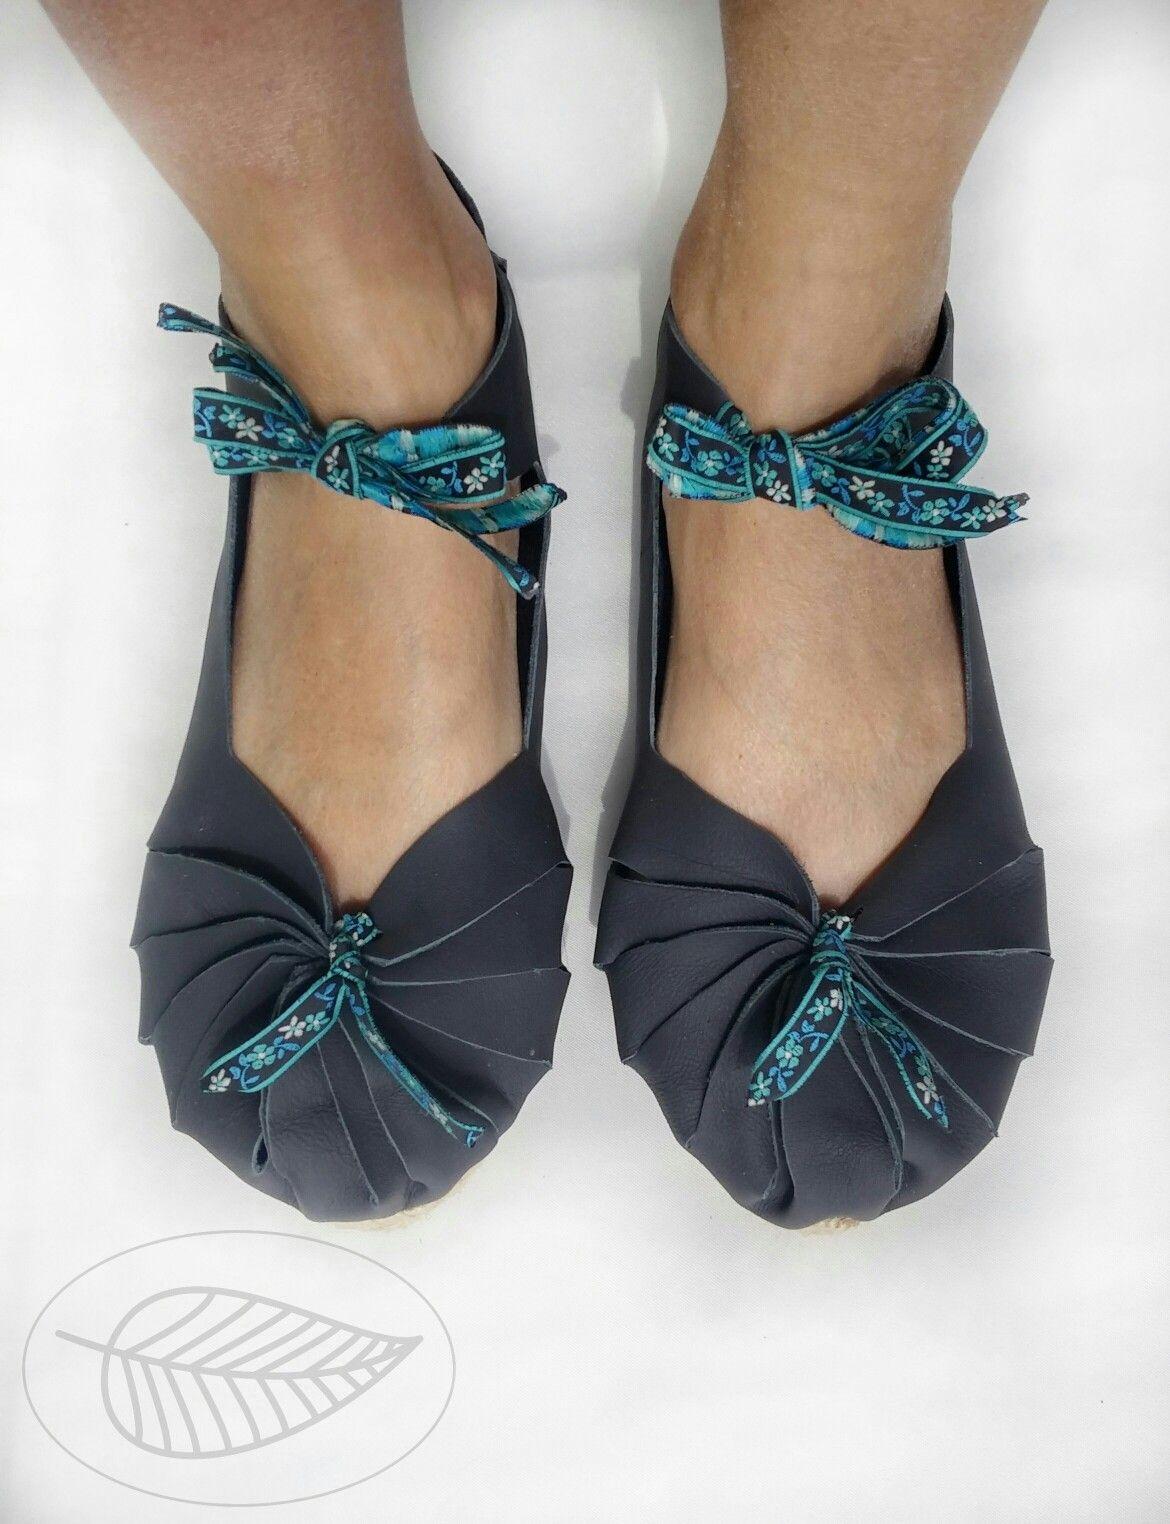 f47b3c50 Celtic shoes with juta soles   Espadrille Monika Benetek Design ...